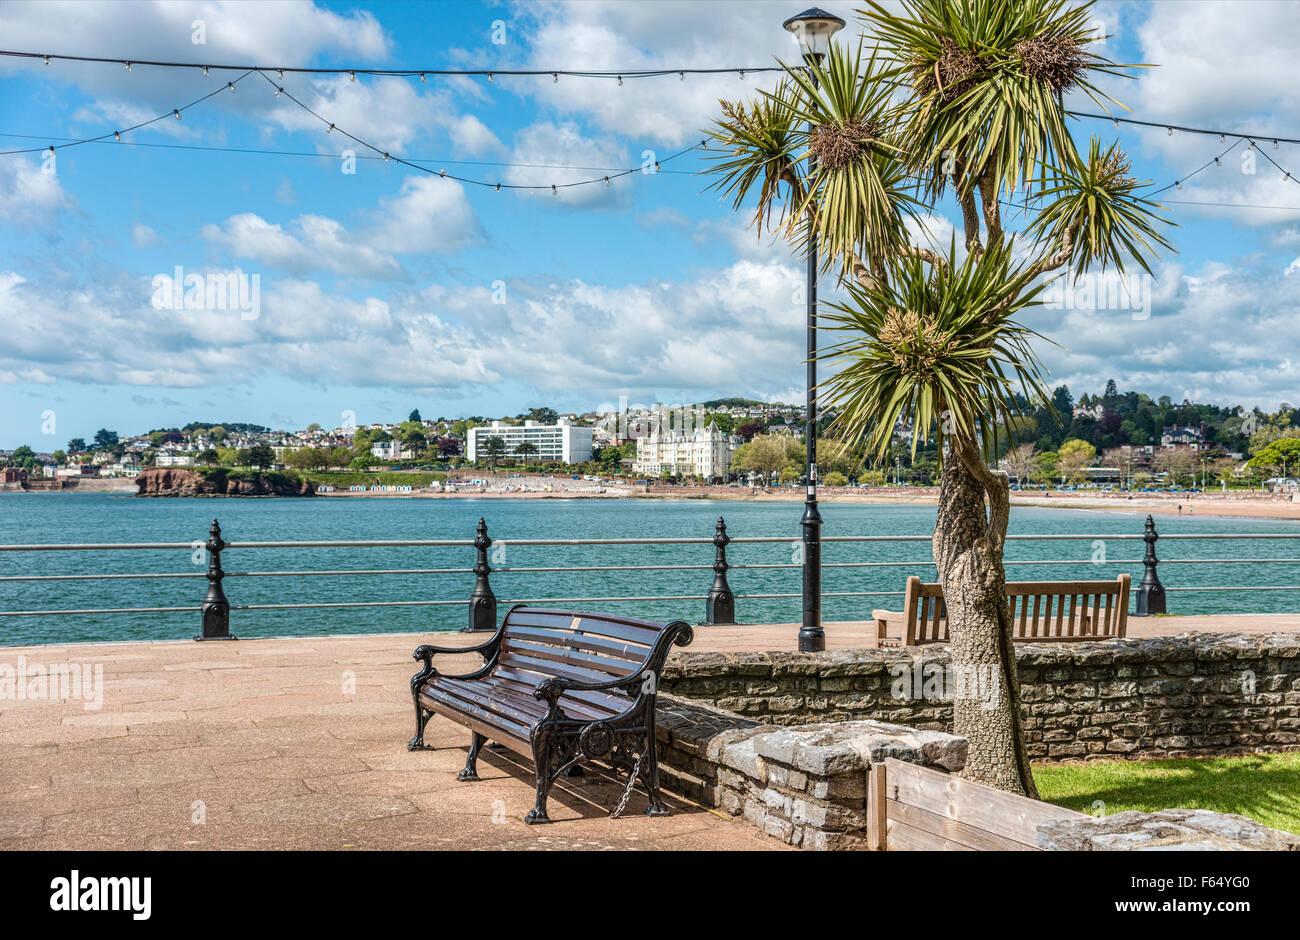 Défilé du port de Torquay, Torbay, England, UK   Hafenpromenade von Torquay, Torbay, England, UK Photo Stock